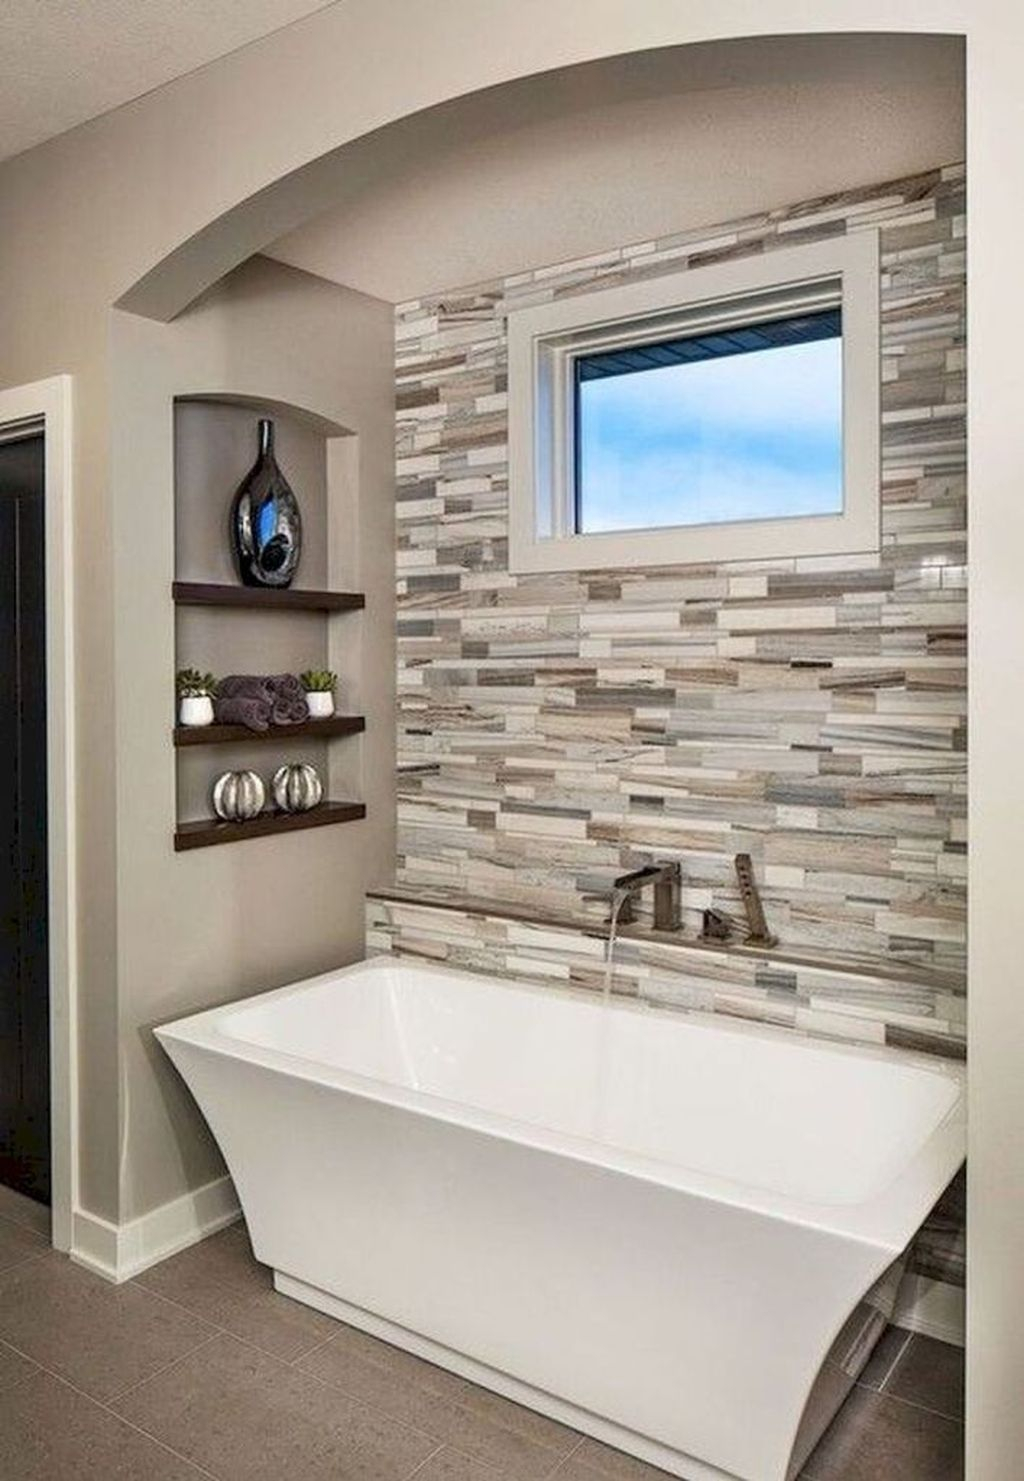 Unusual Bathroom Design Ideas You Need To Know 29